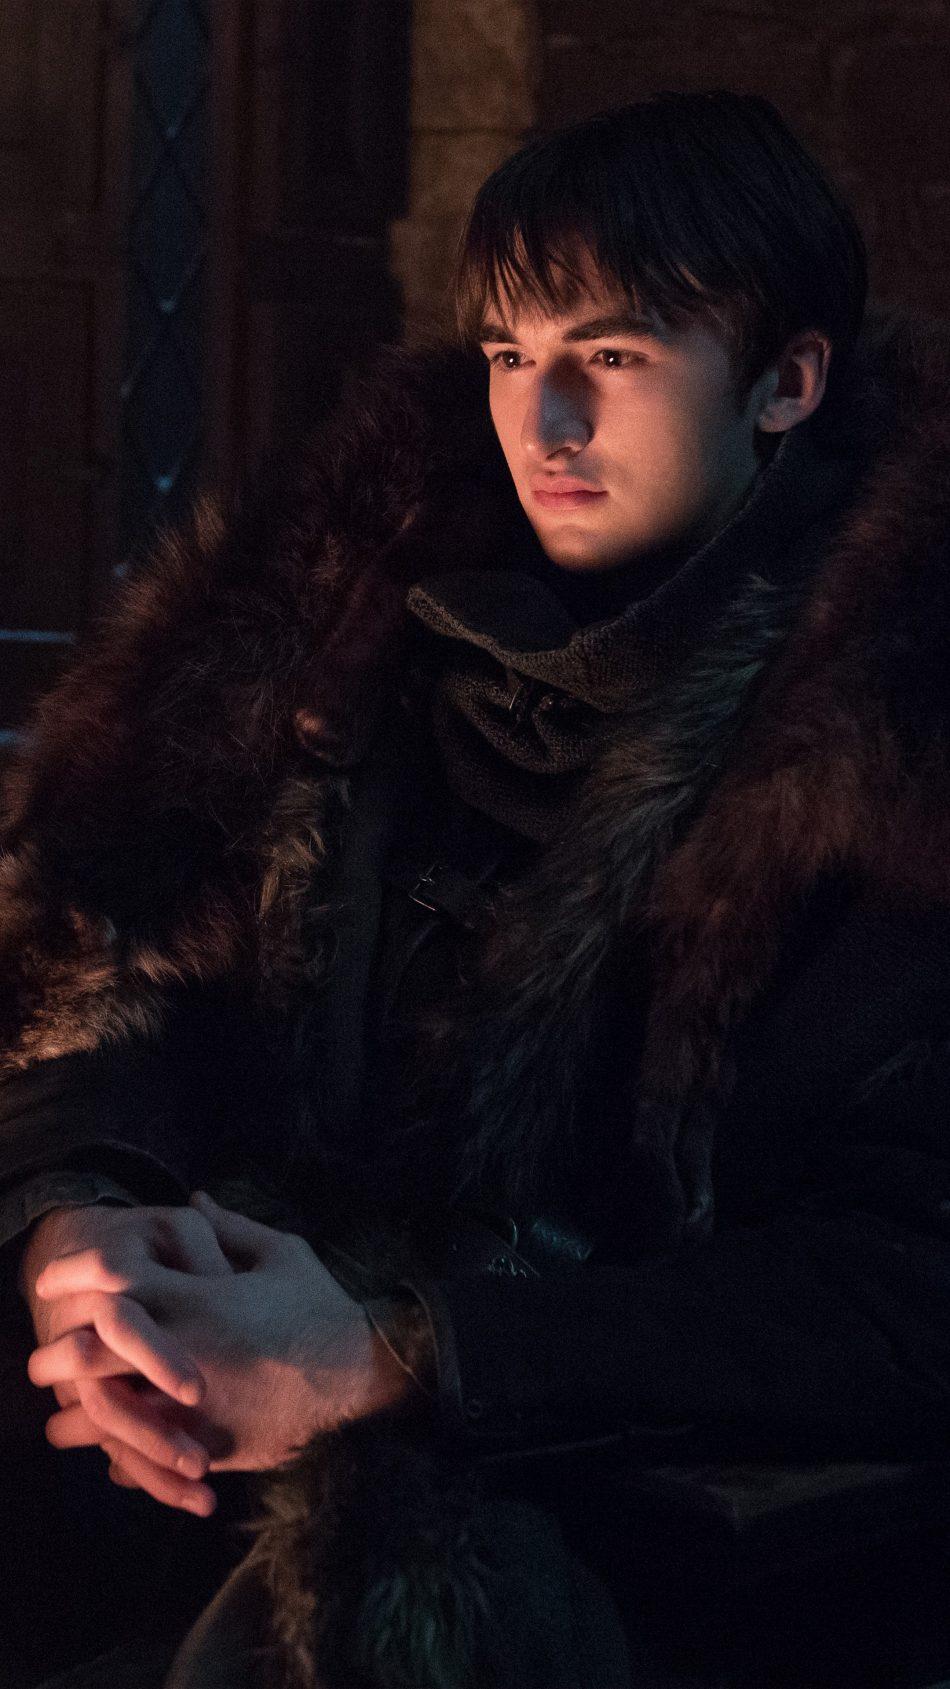 Bran Stark Game Of Thrones 4k Ultra Hd Mobile Wallpaper - Brahma Game Of Thrones , HD Wallpaper & Backgrounds